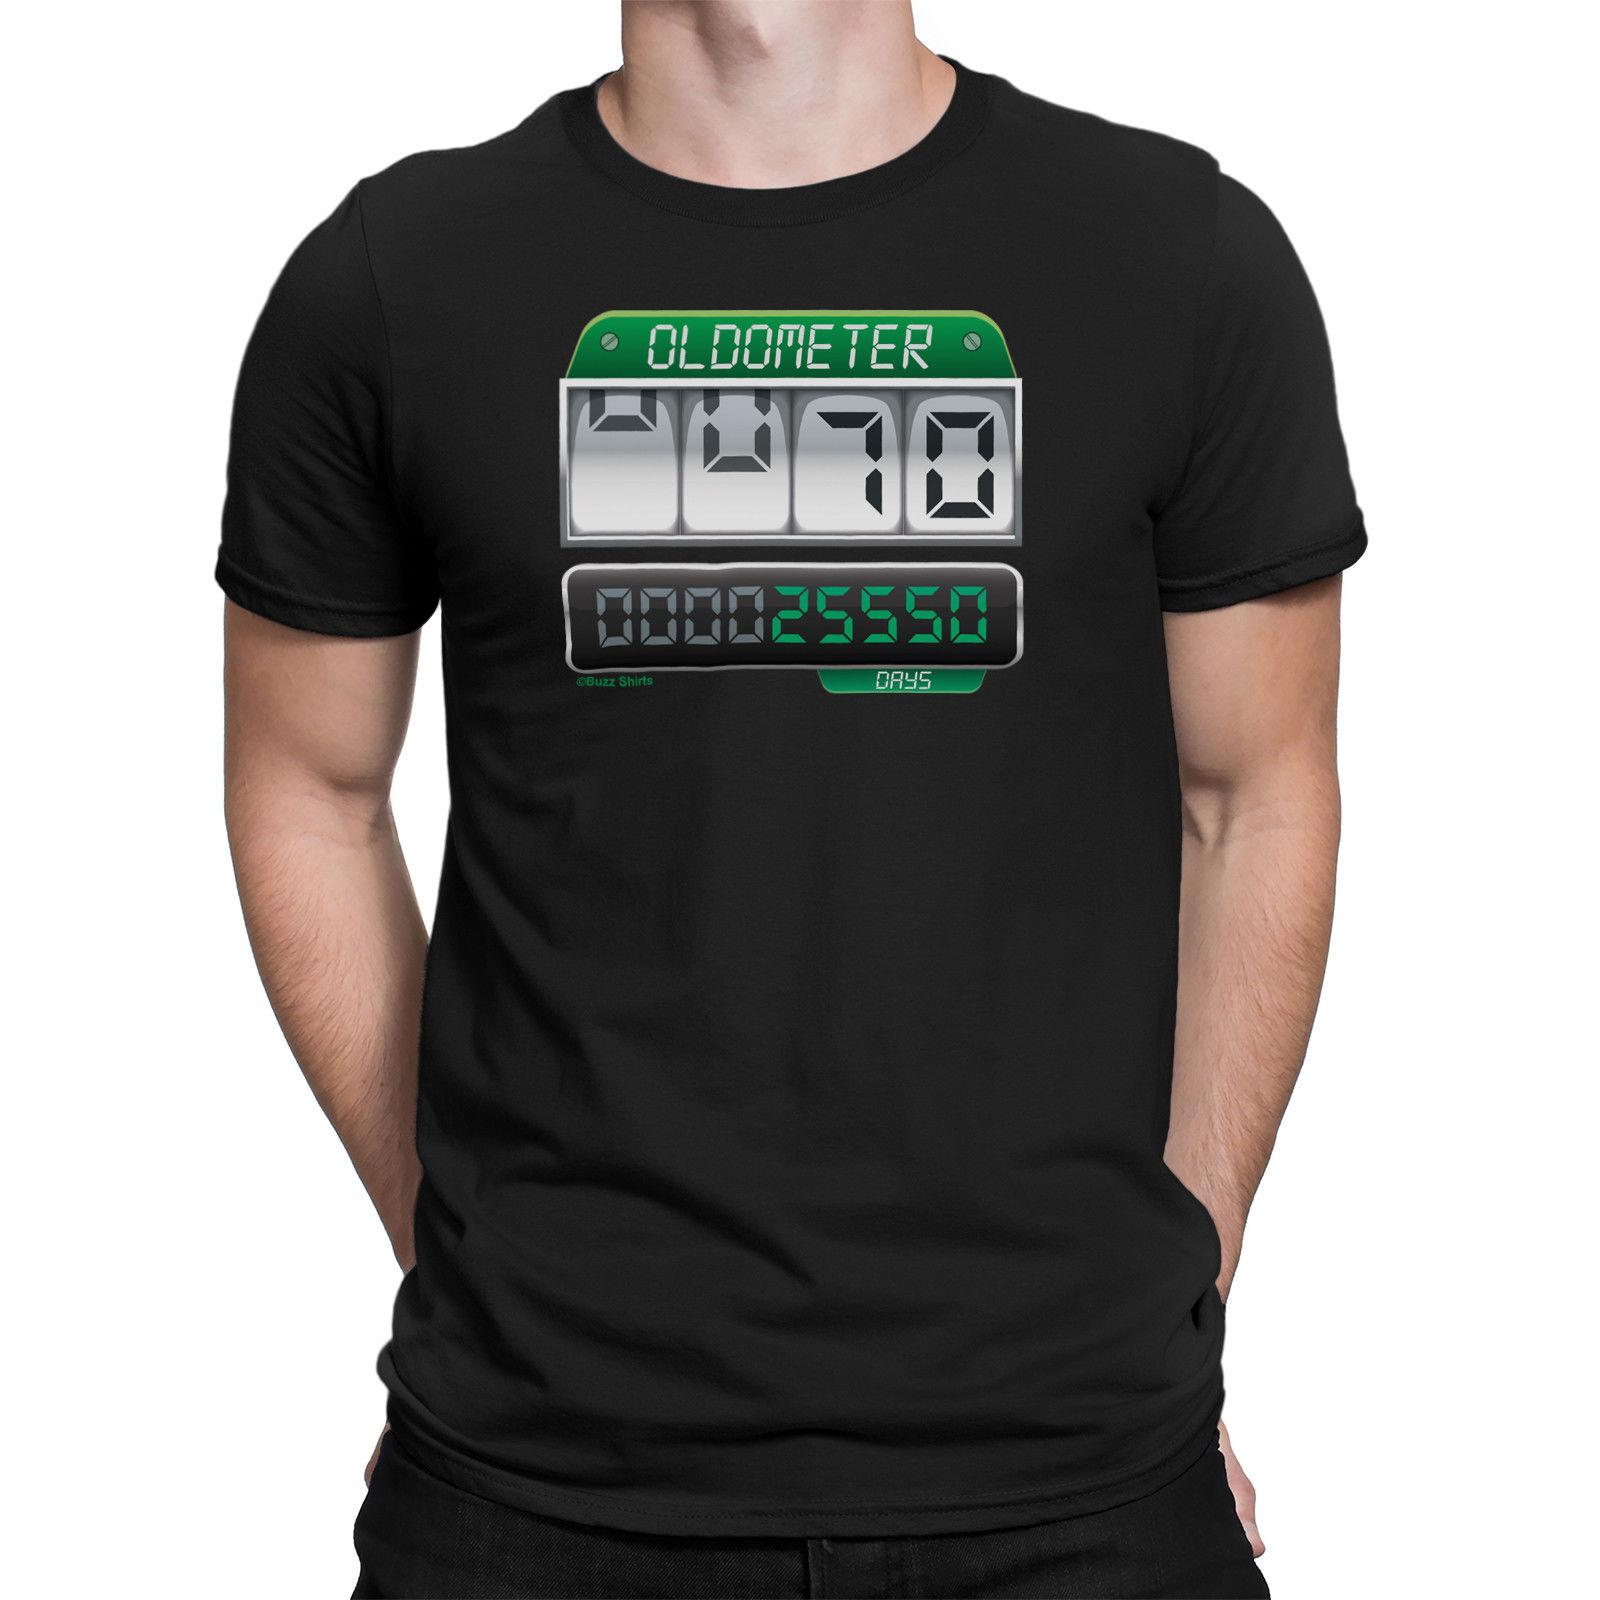 a7850a986b9 Compre Camiseta Para Hombre 70th BADTHDAY OLDOMETER 70 Años Old Joke Gift  Seventy A  11.67 Del Caisemao02